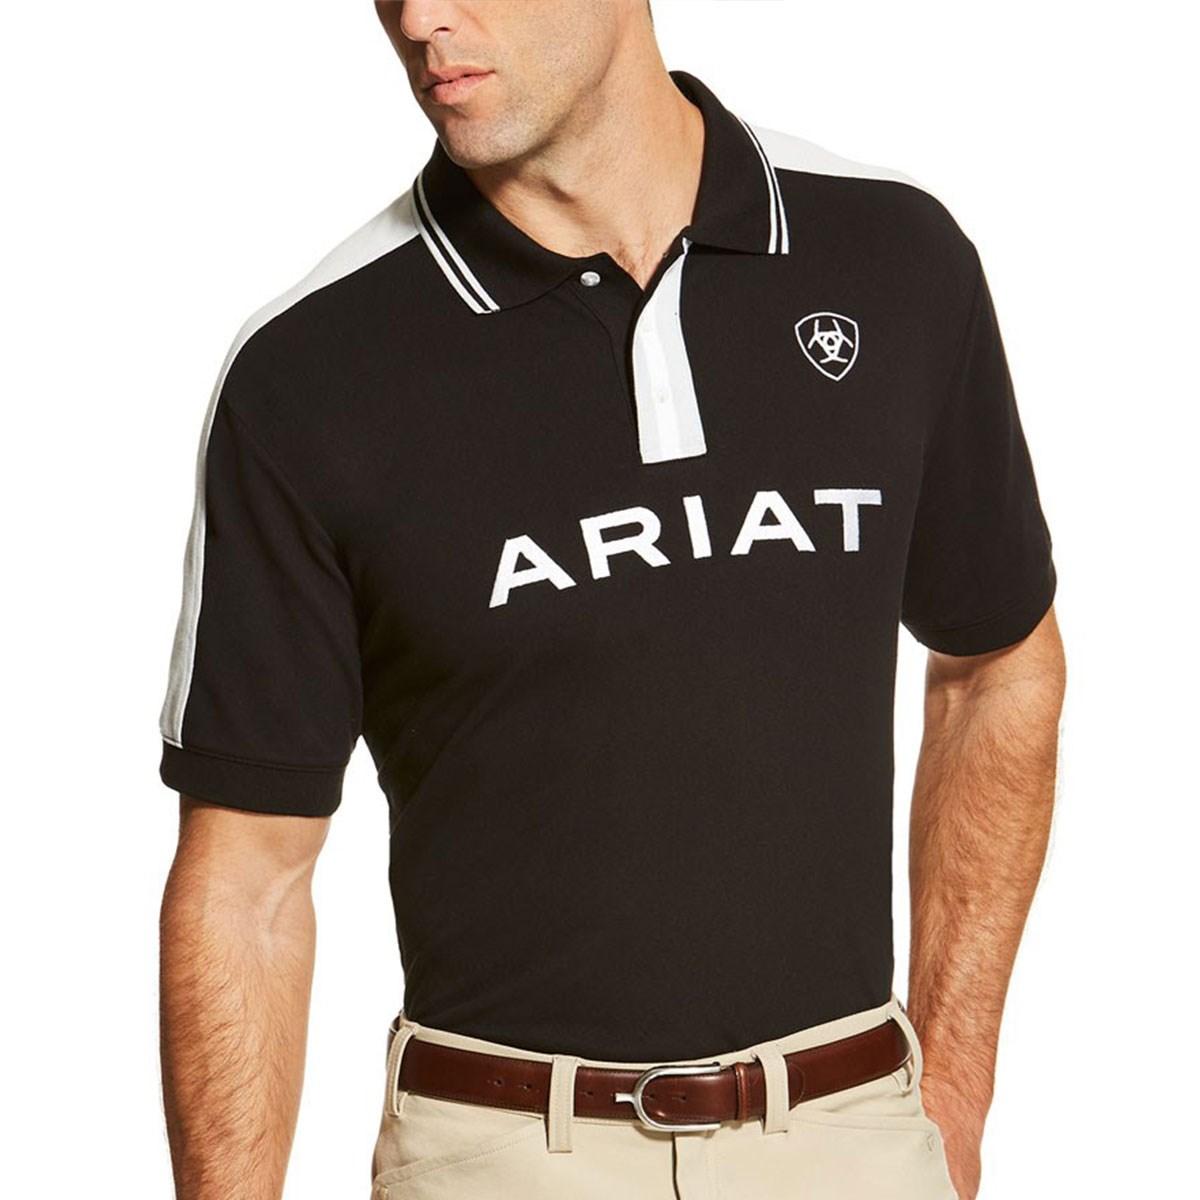 ee3922d4 Ariat New Team Mens Polo Shirt - Black - Redpost Equestrian